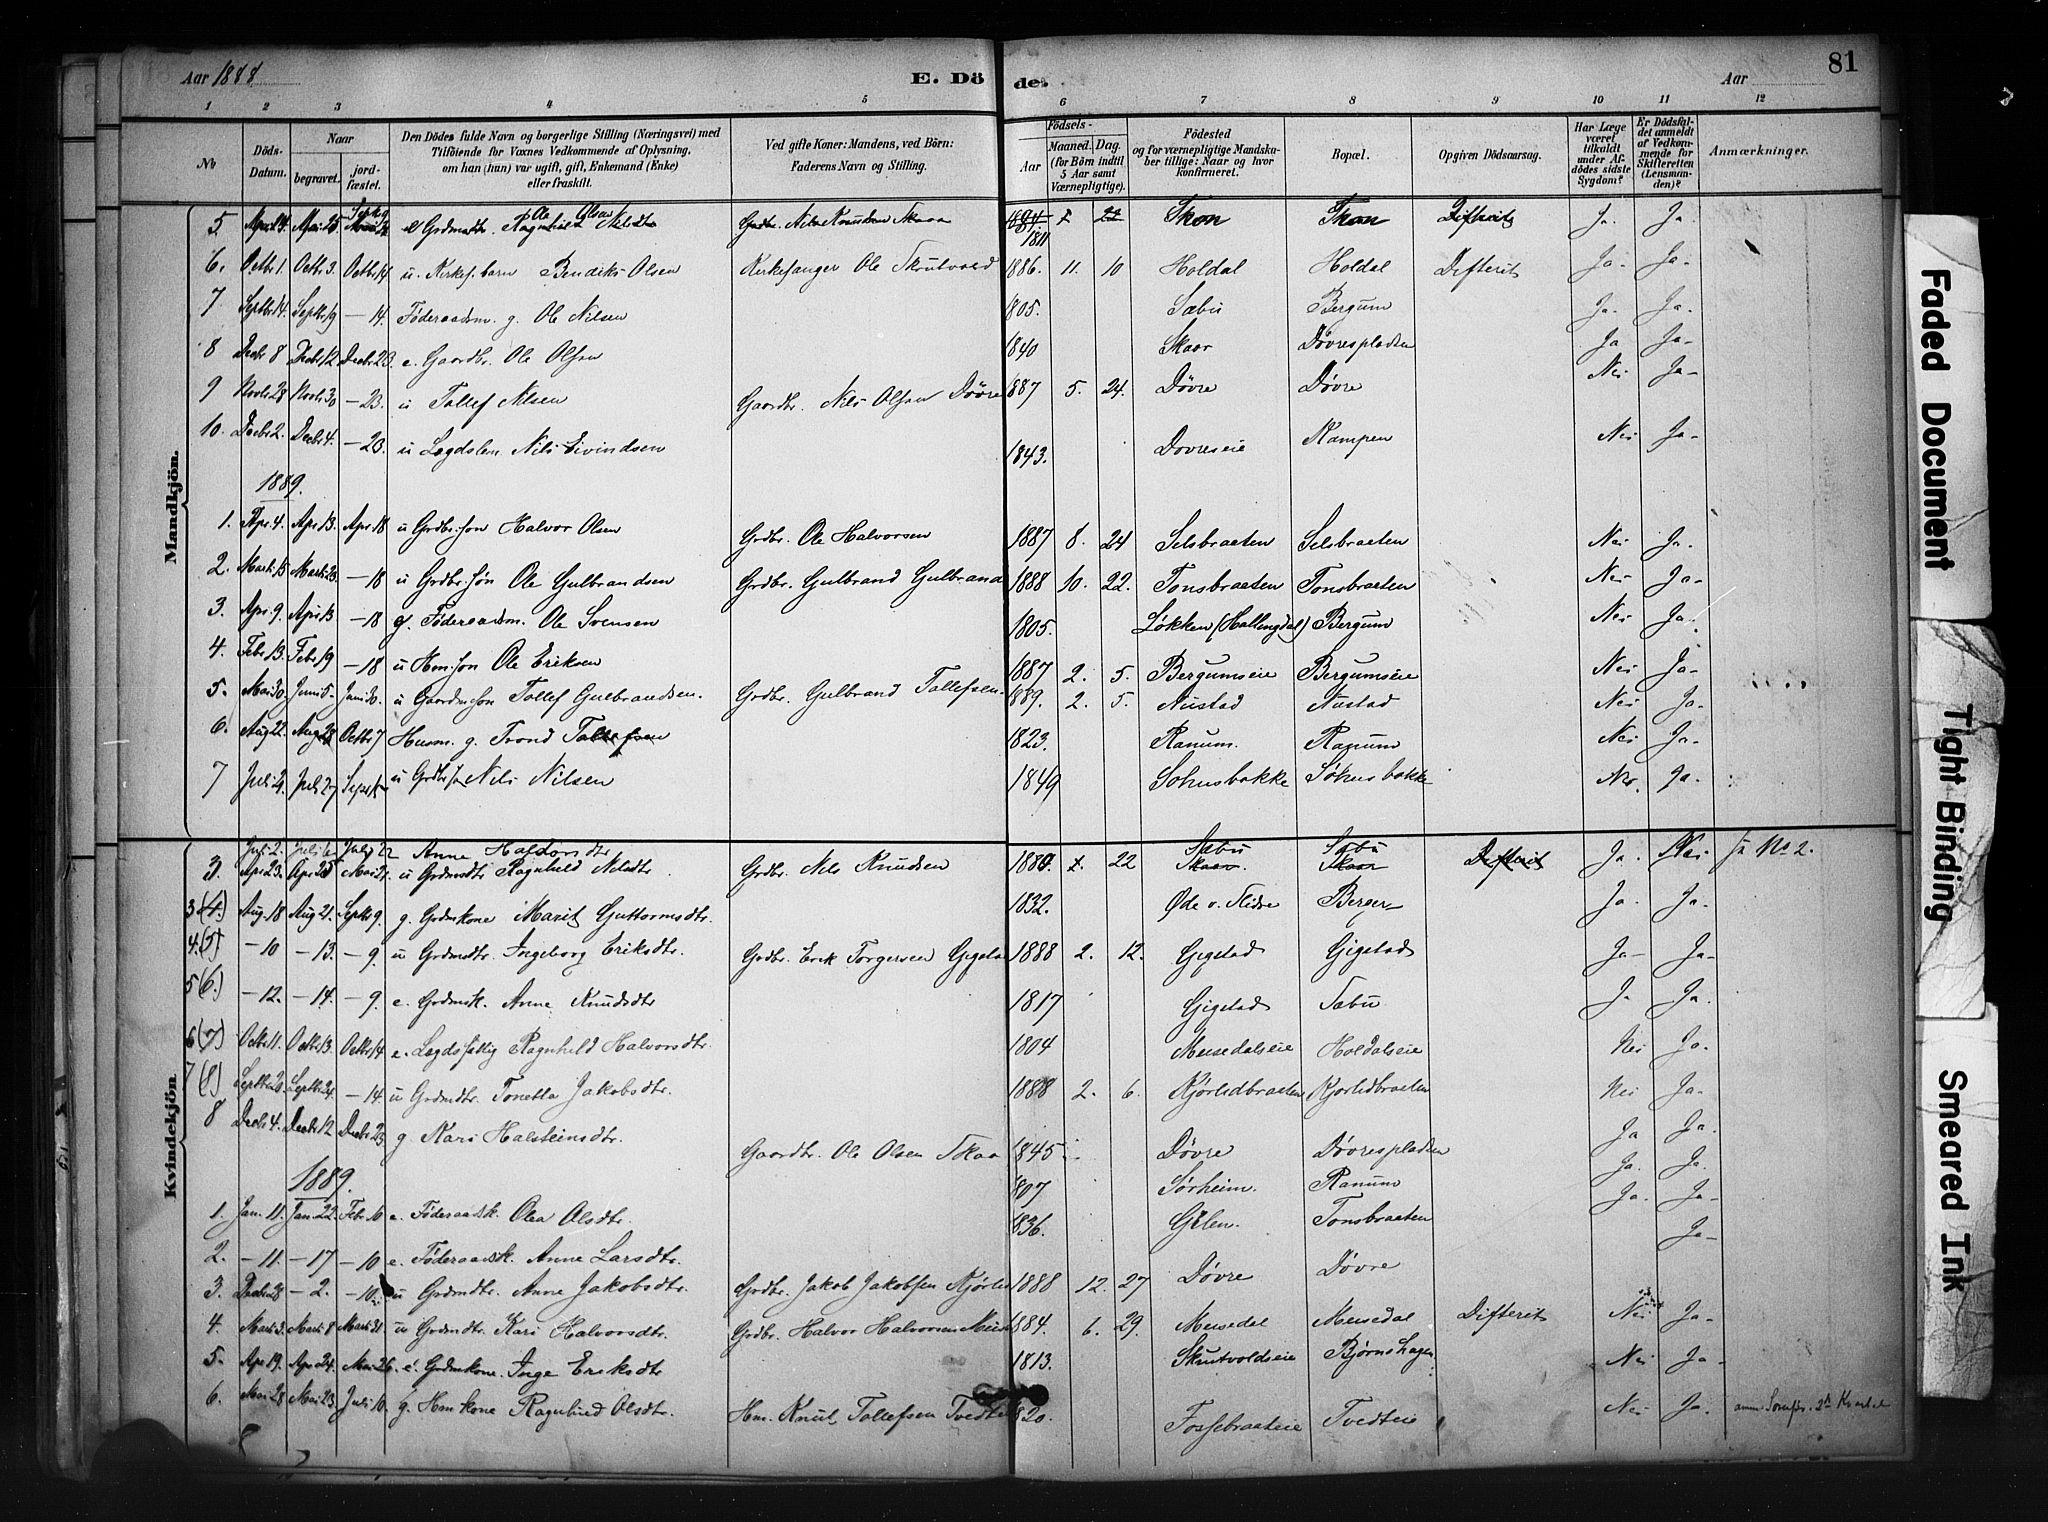 SAH, Nord-Aurdal prestekontor, Ministerialbok nr. 12, 1883-1895, s. 81